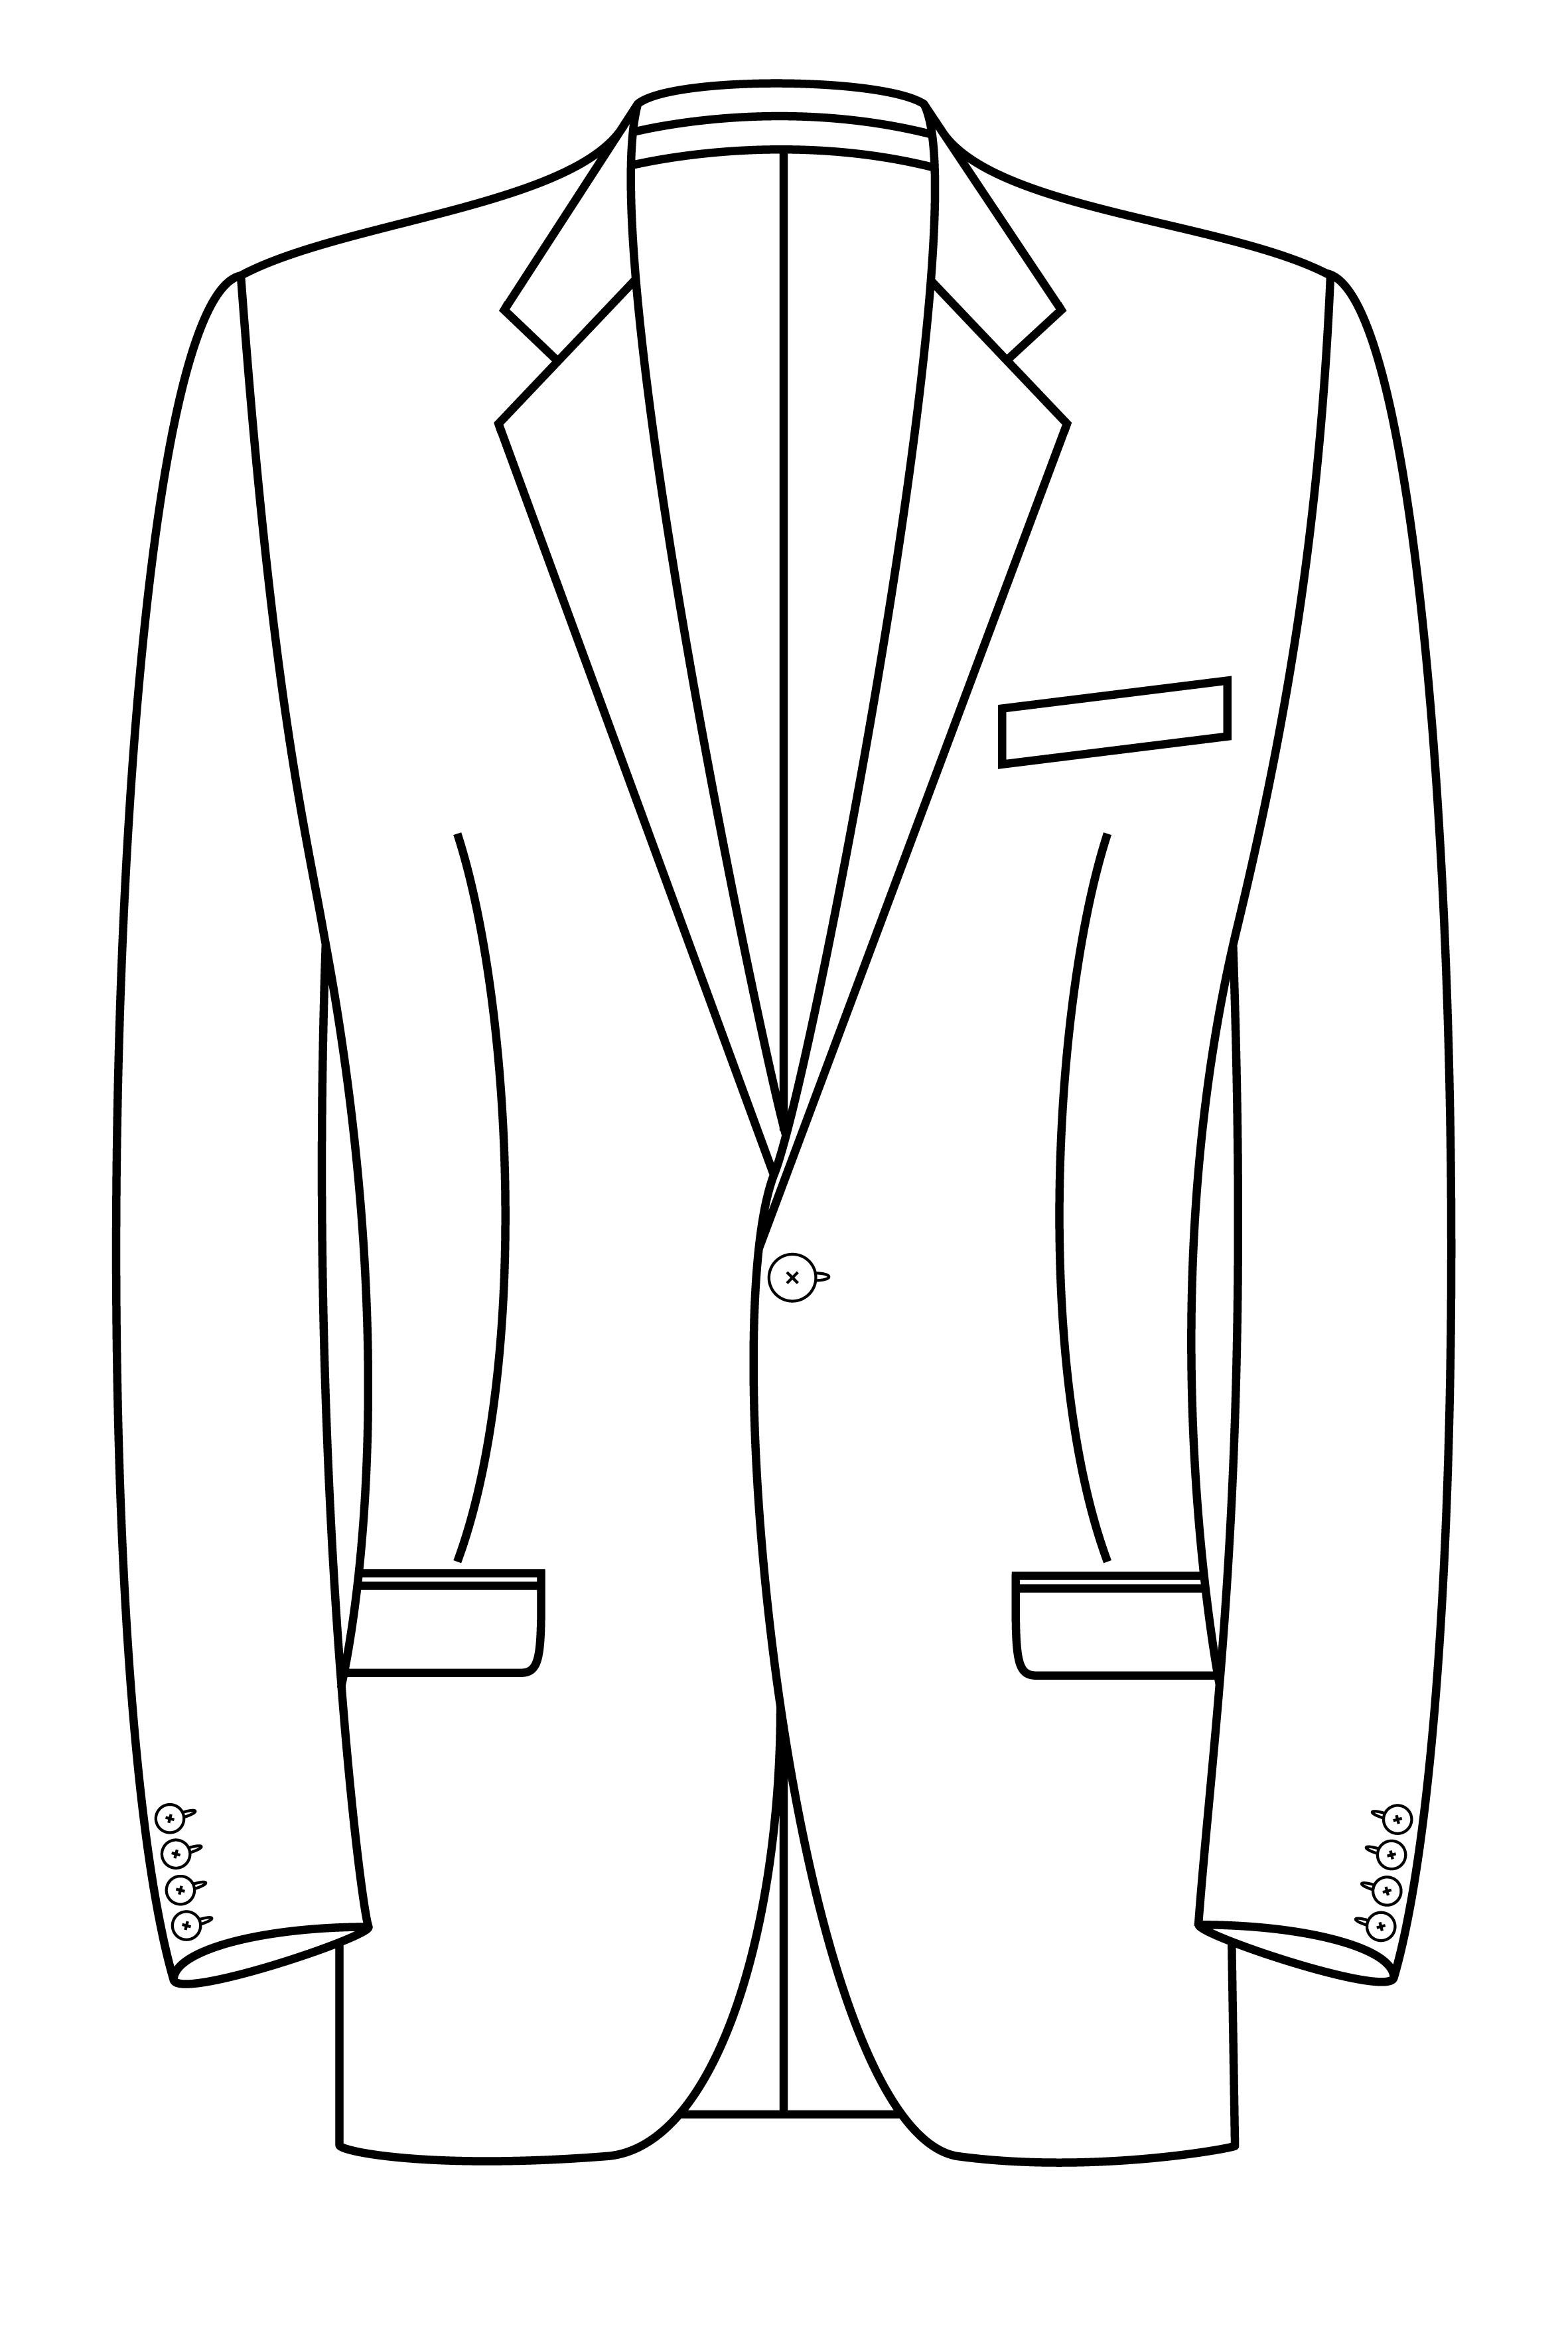 1 knoops jas met weggesneden revers